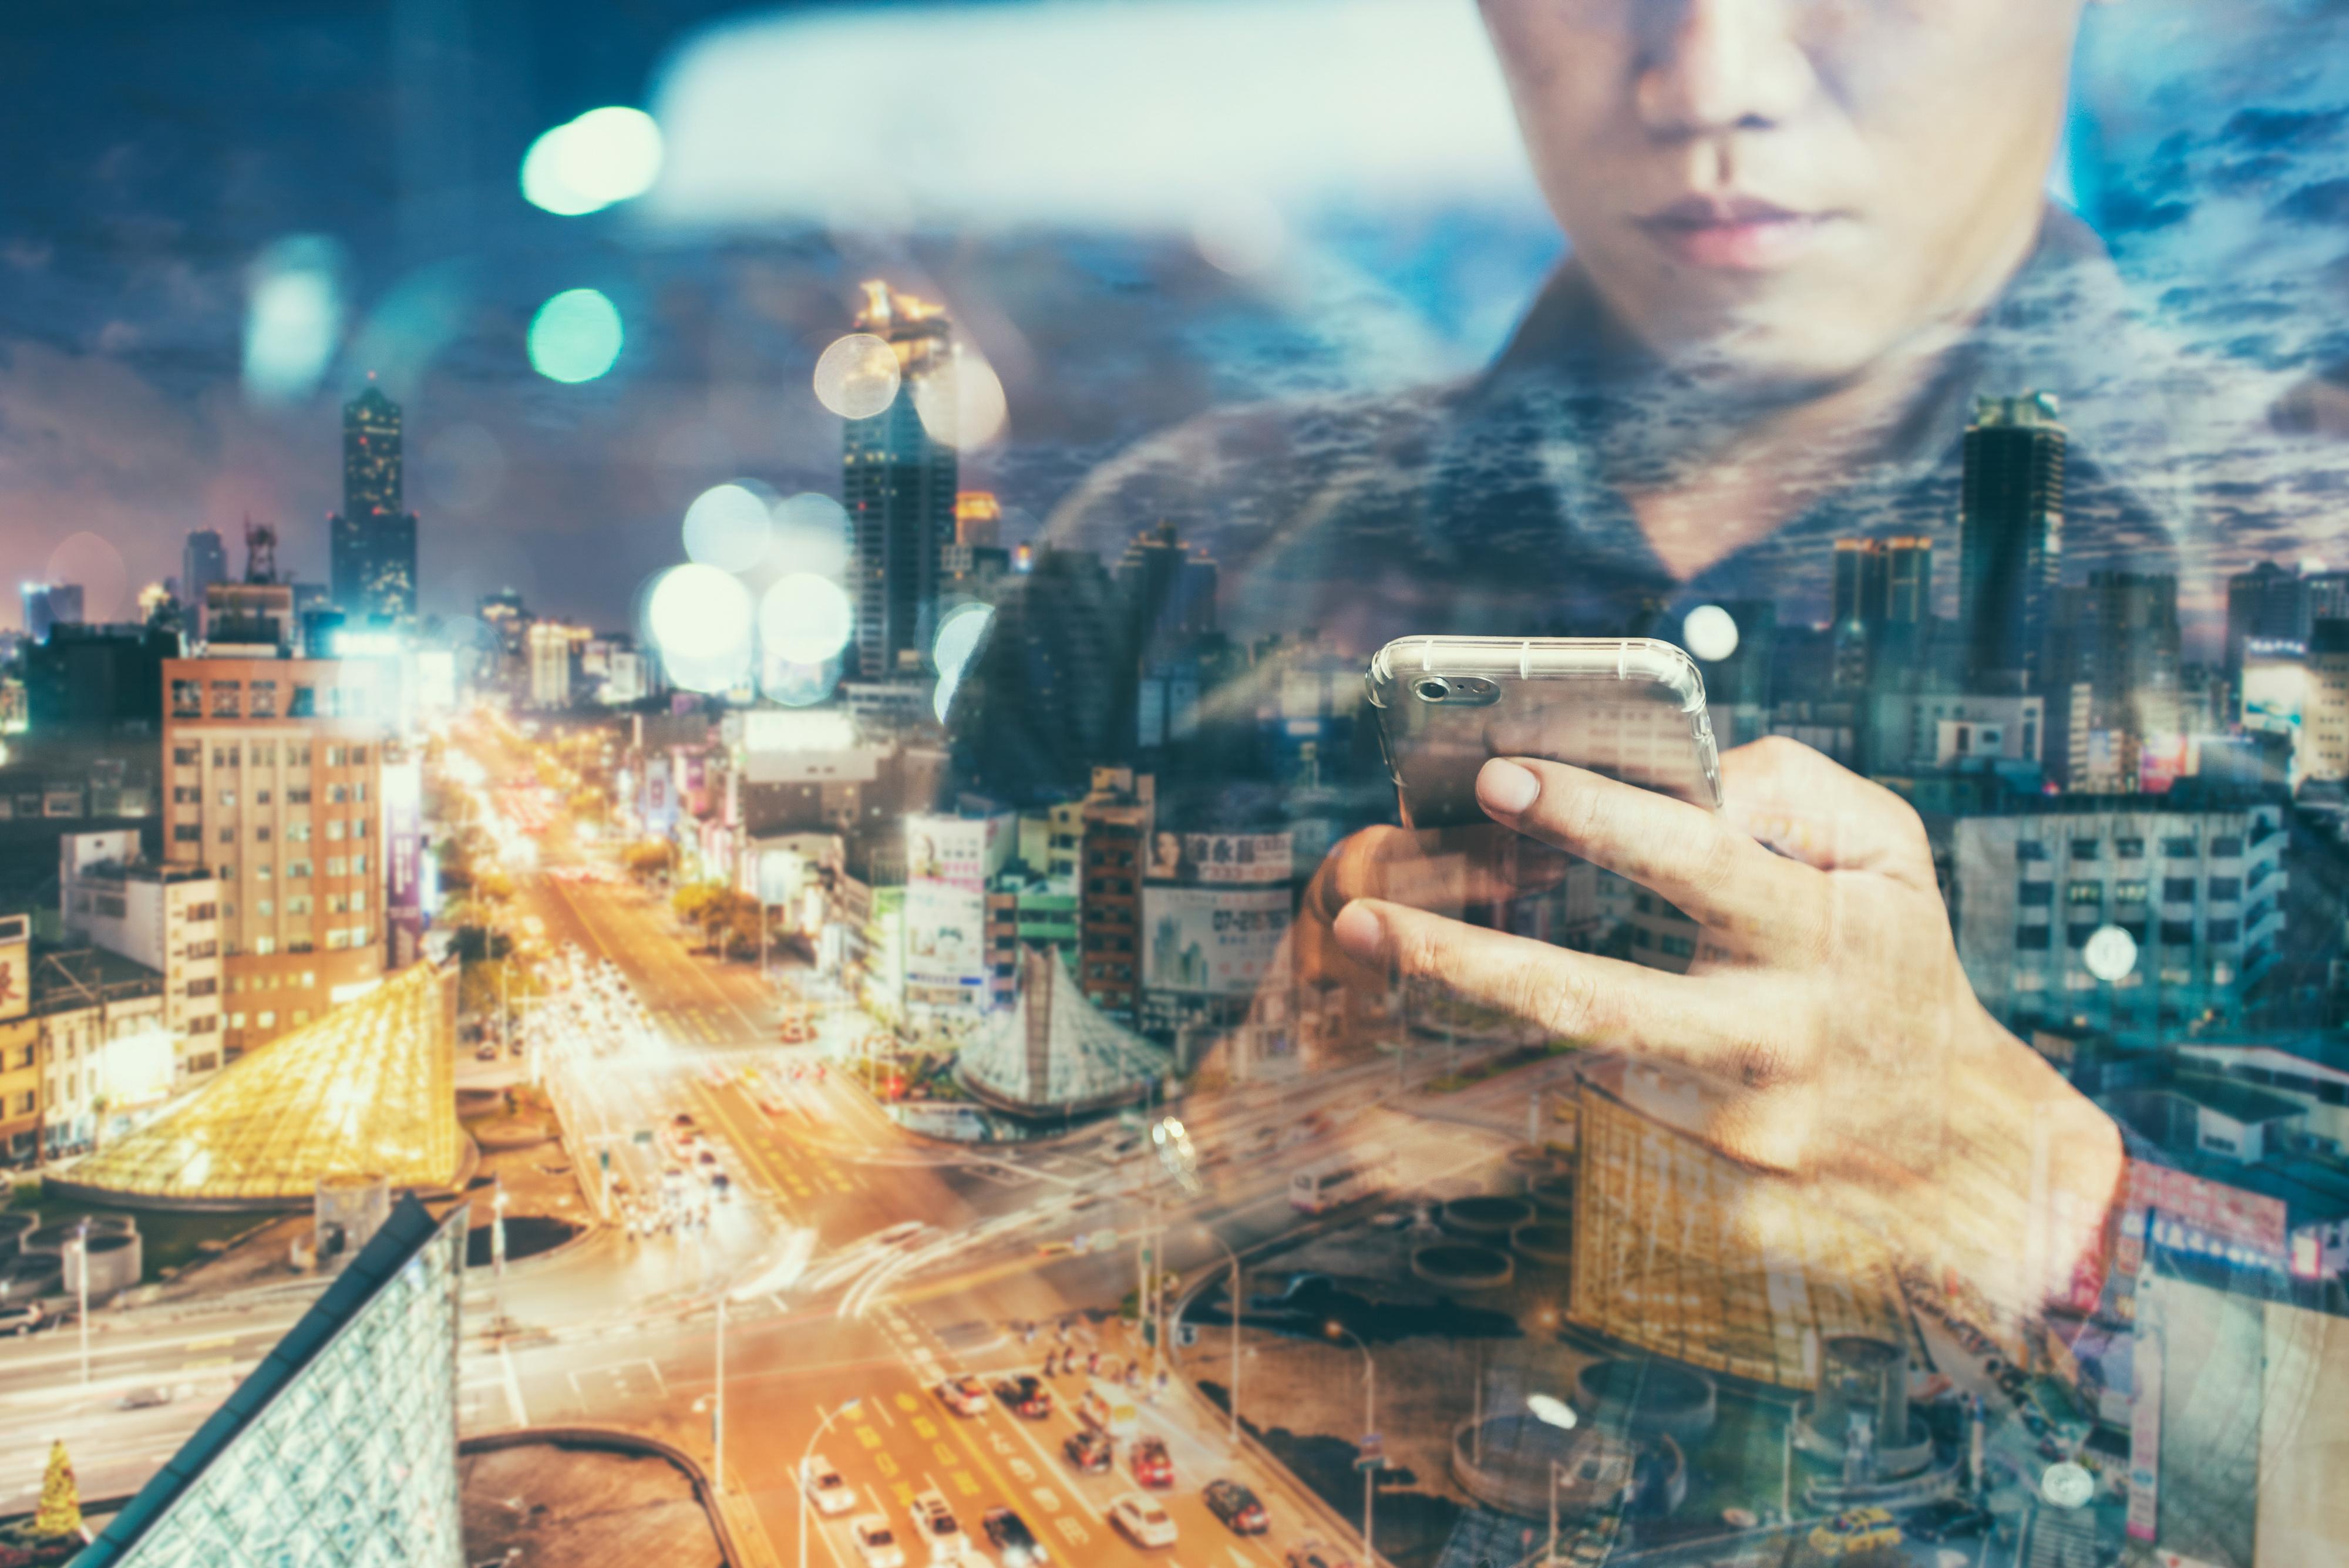 Global mobility market